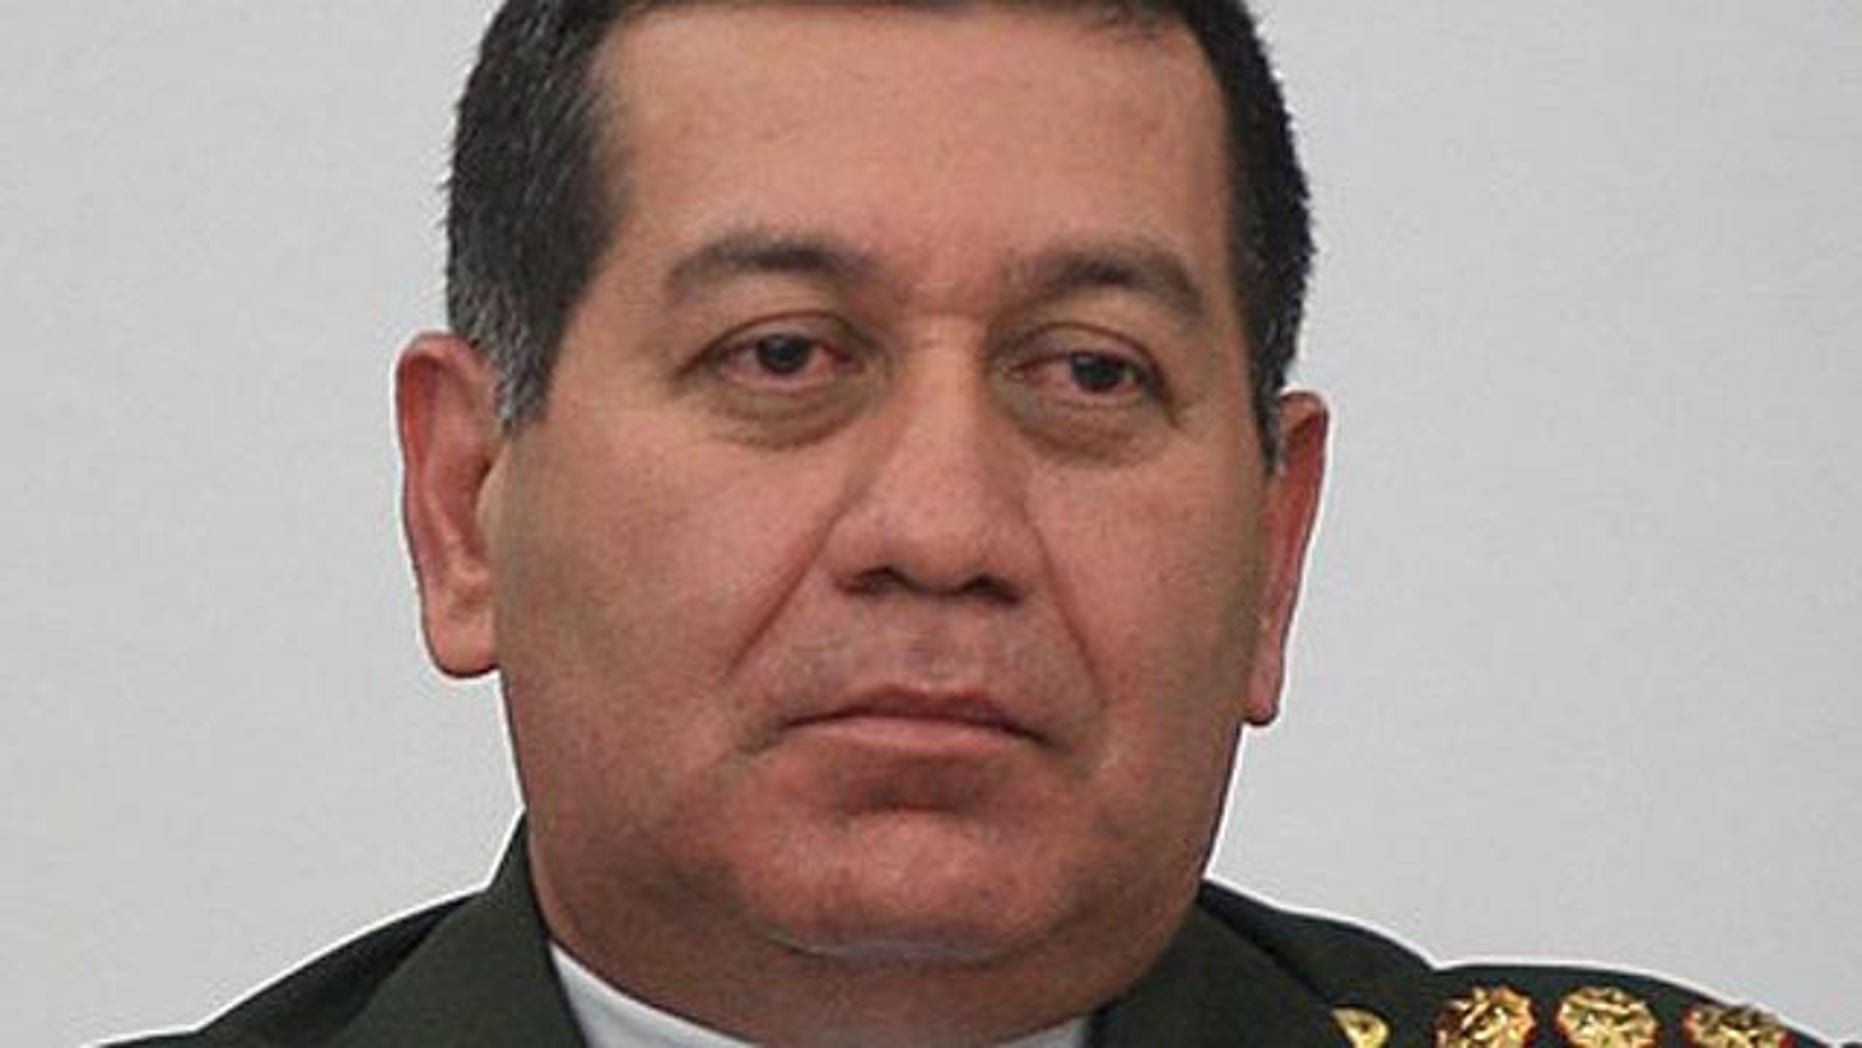 Nov. 11: Venezuelan General Henry Rangel Silva attends a cabinet meeting with President Hugo Chavez, not pictured, in Caracas.  (Reuters)